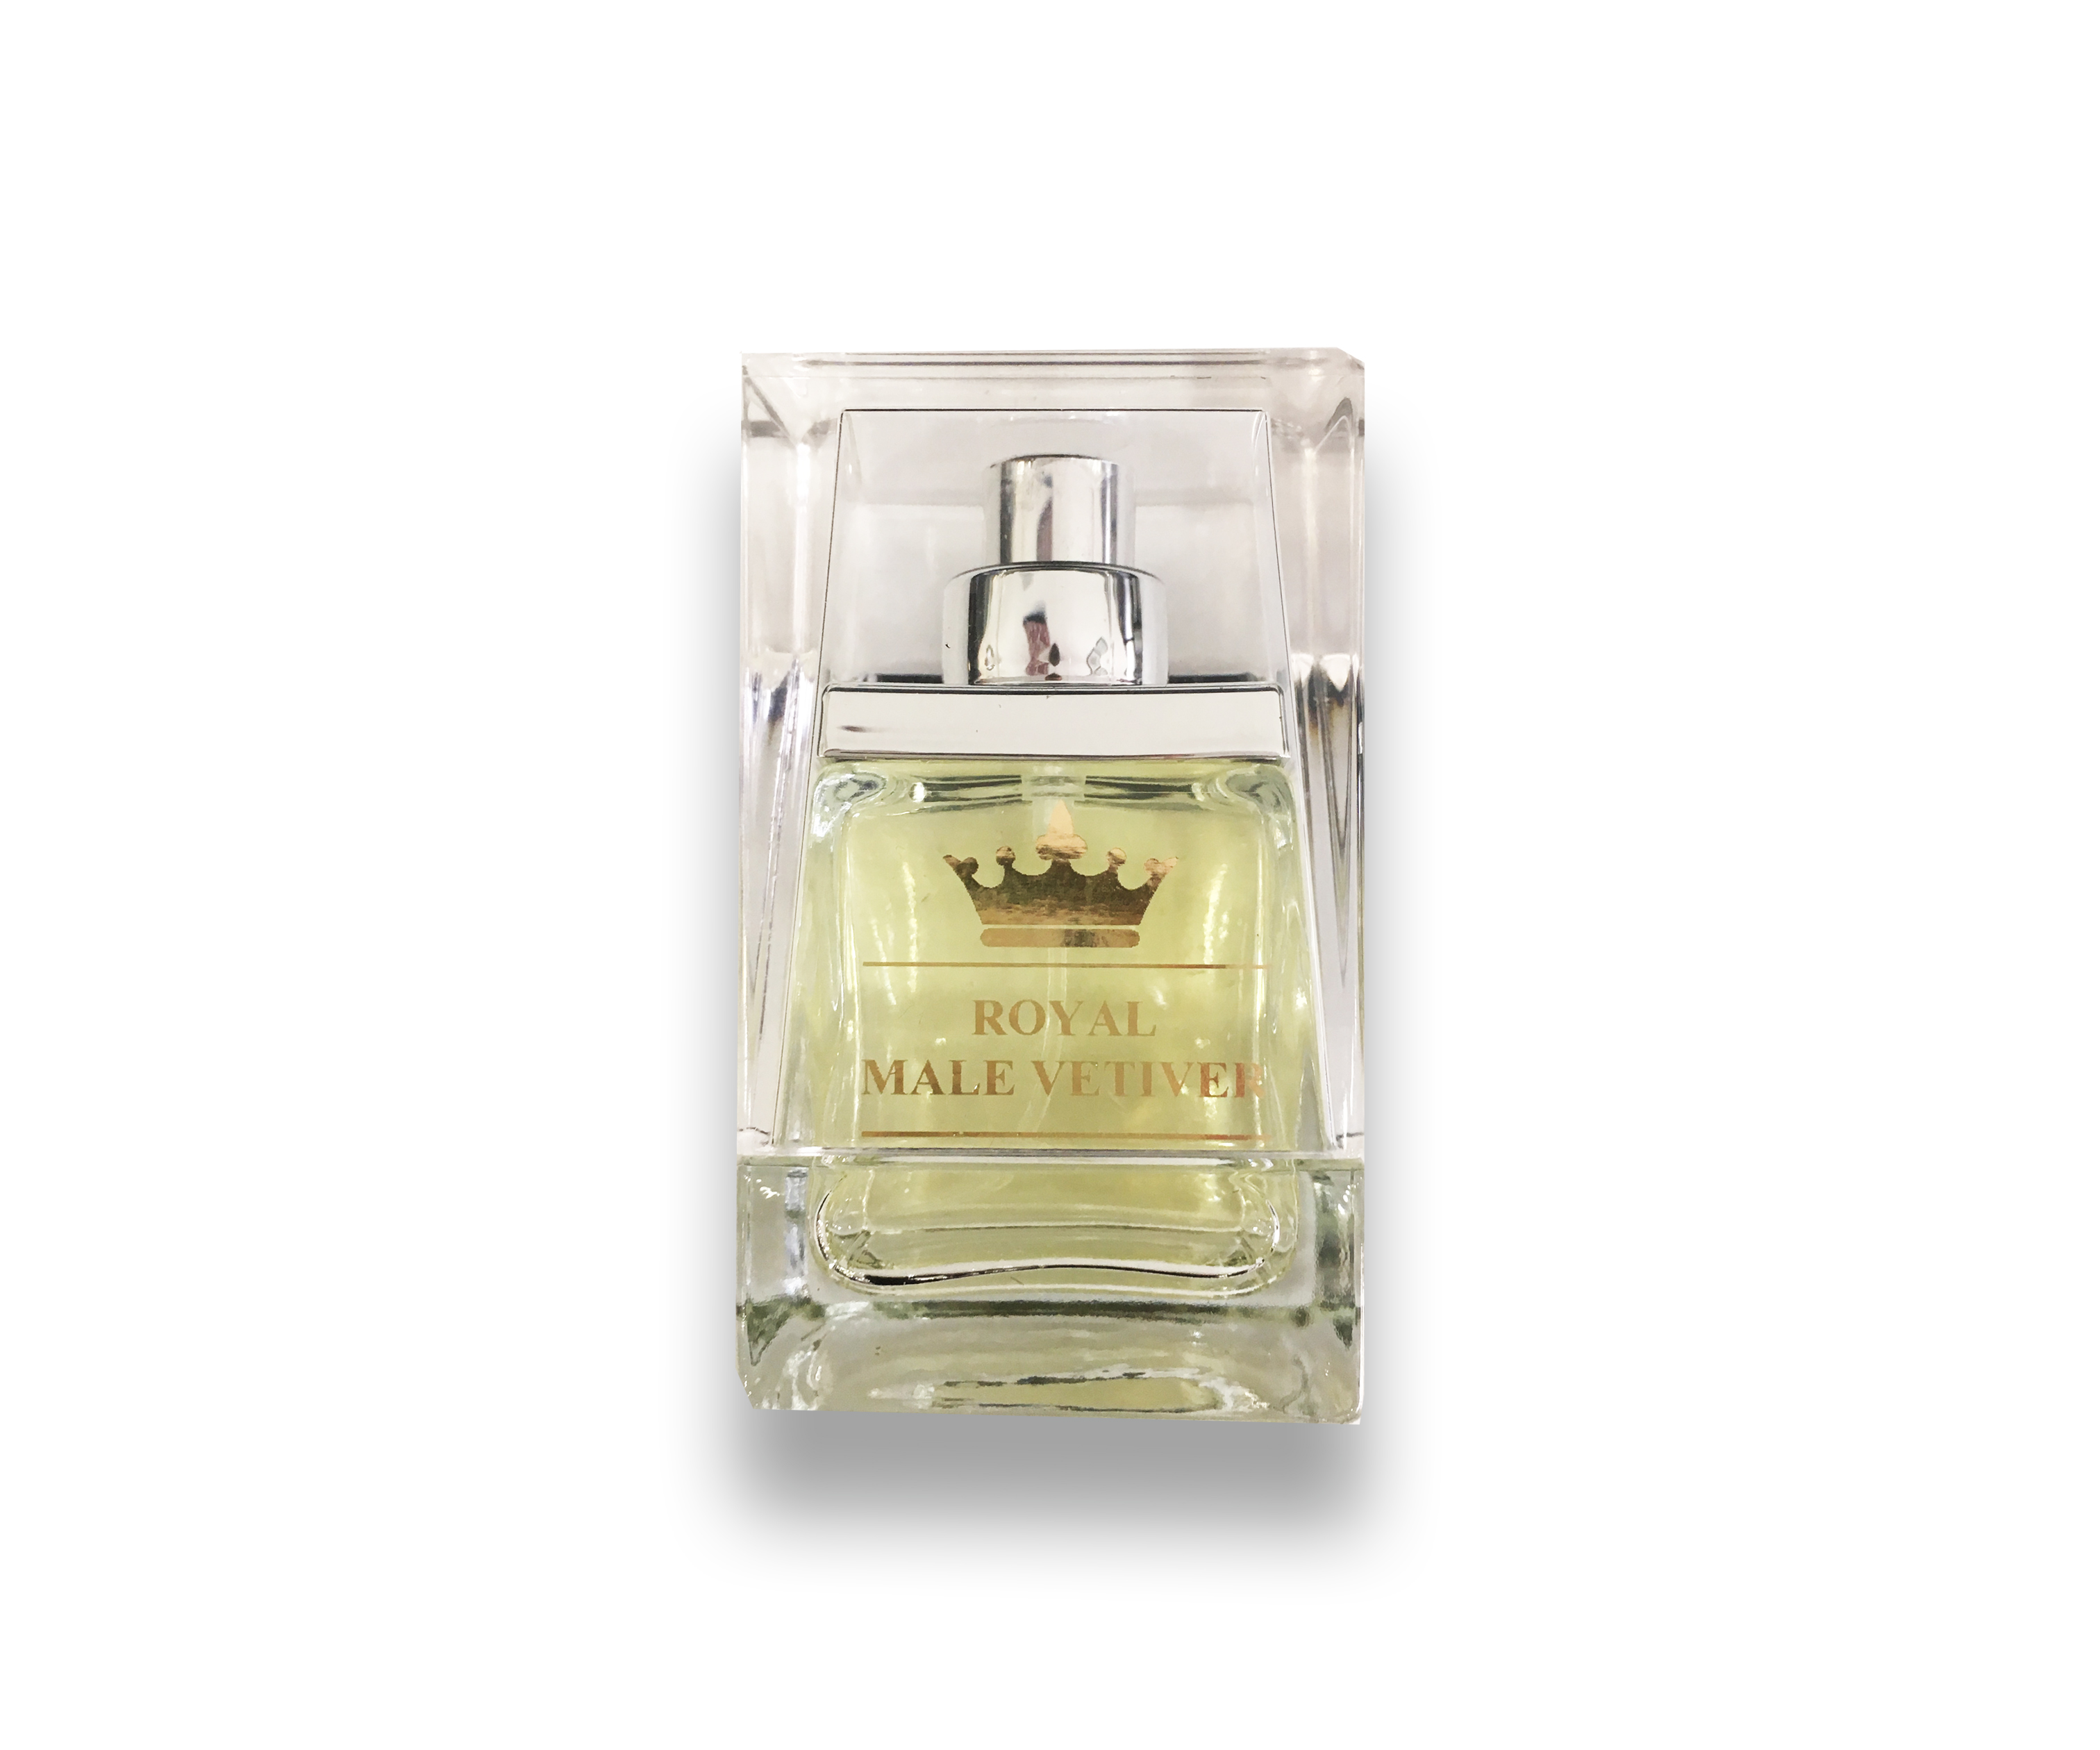 Fragrance: Royal